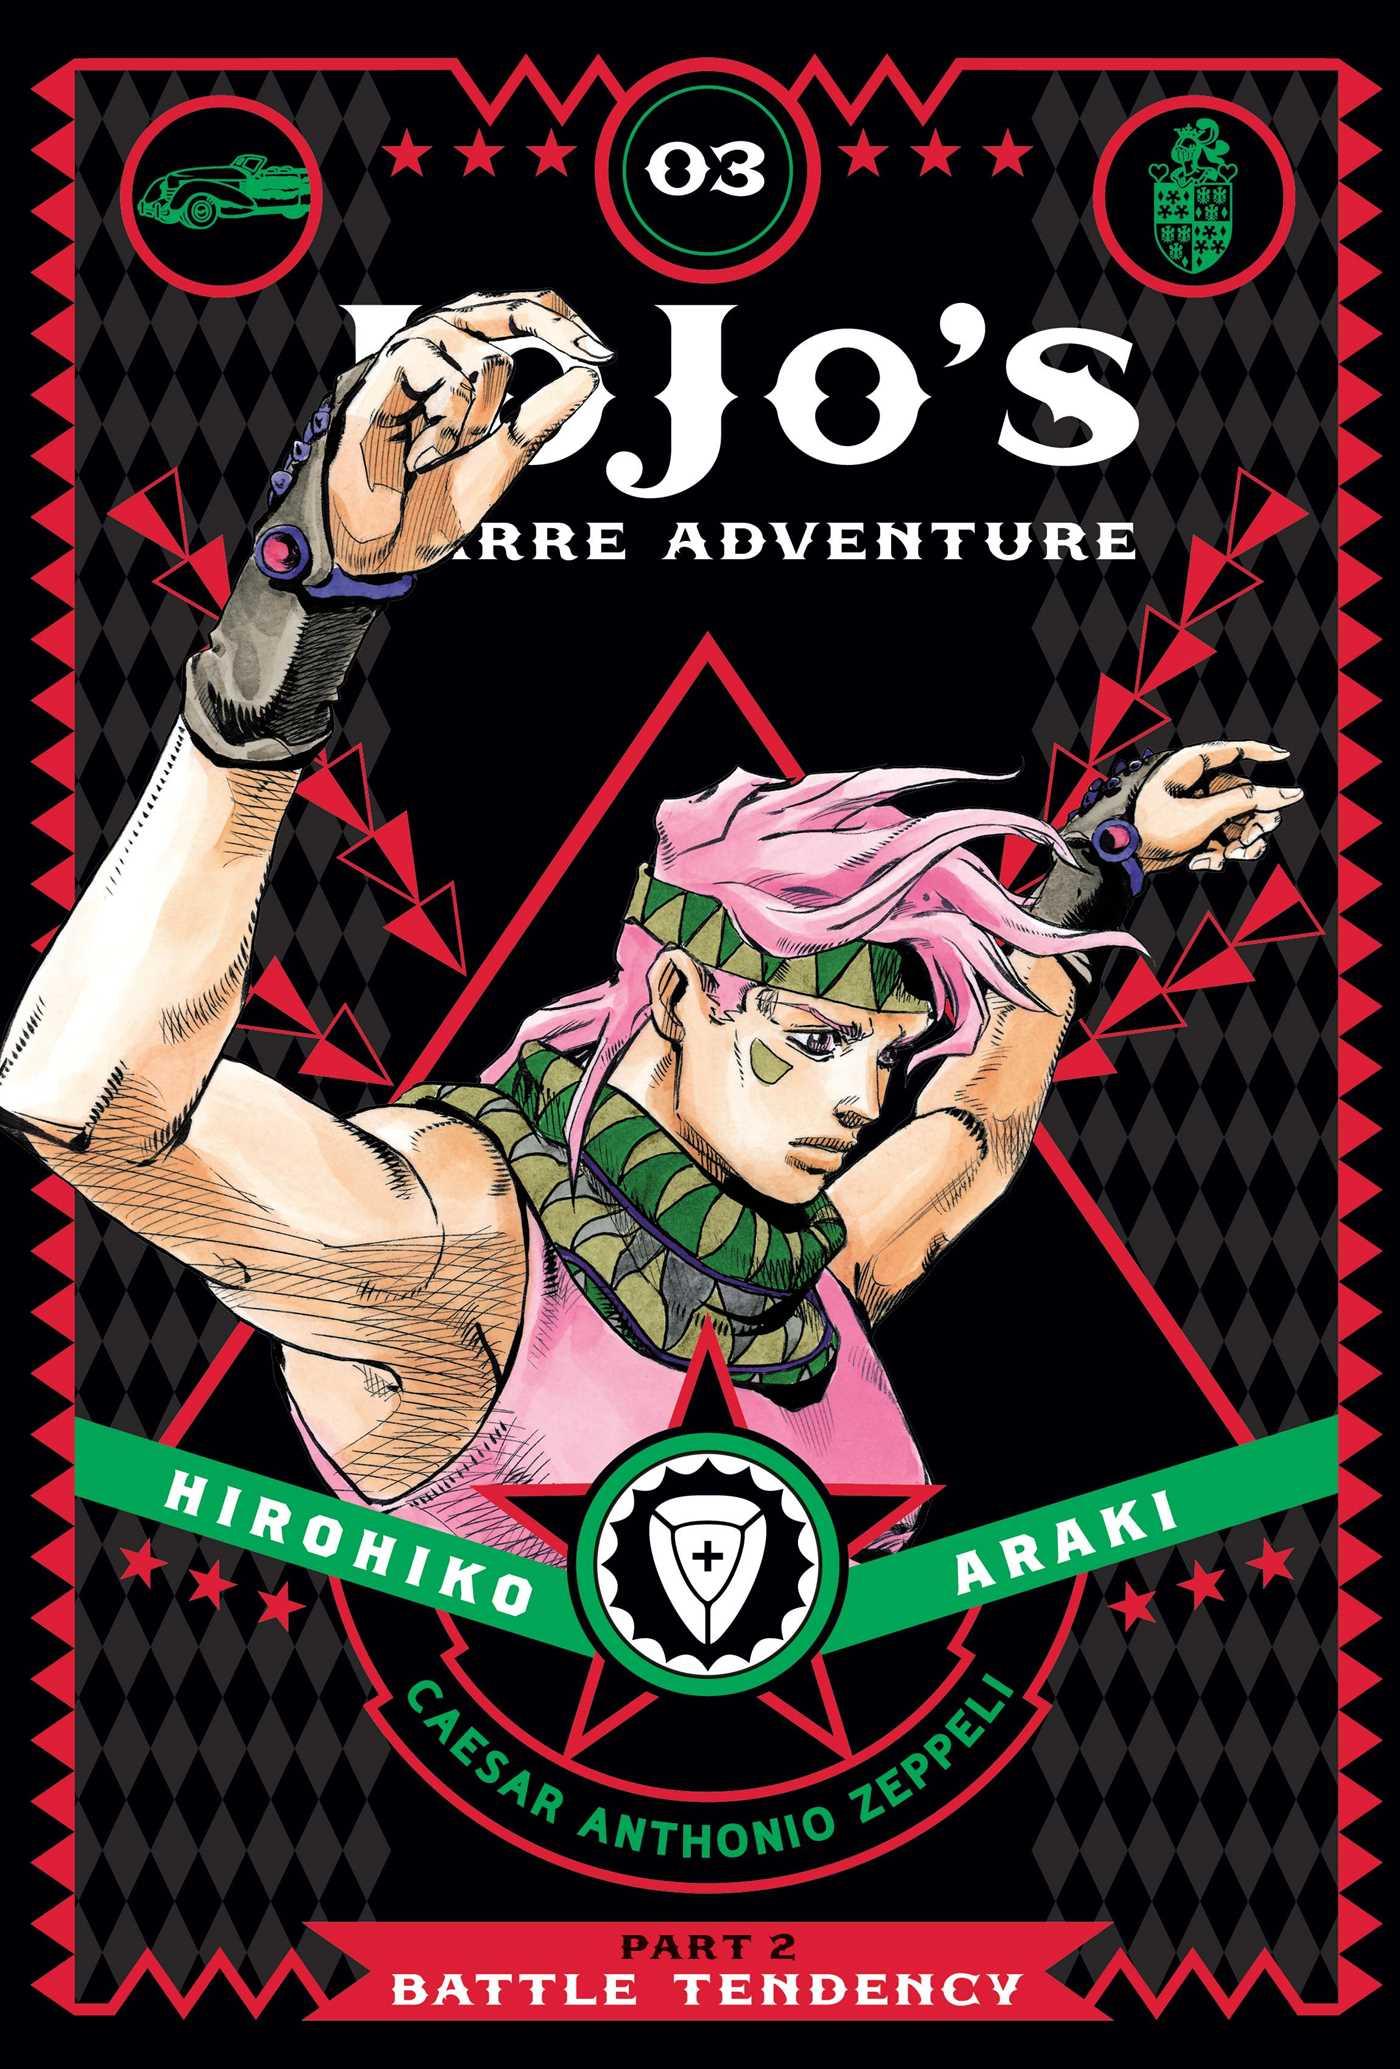 JoJos Bizarre Adventure Part 2 Battle Tendency Manga Volume 3 (Hardcover)